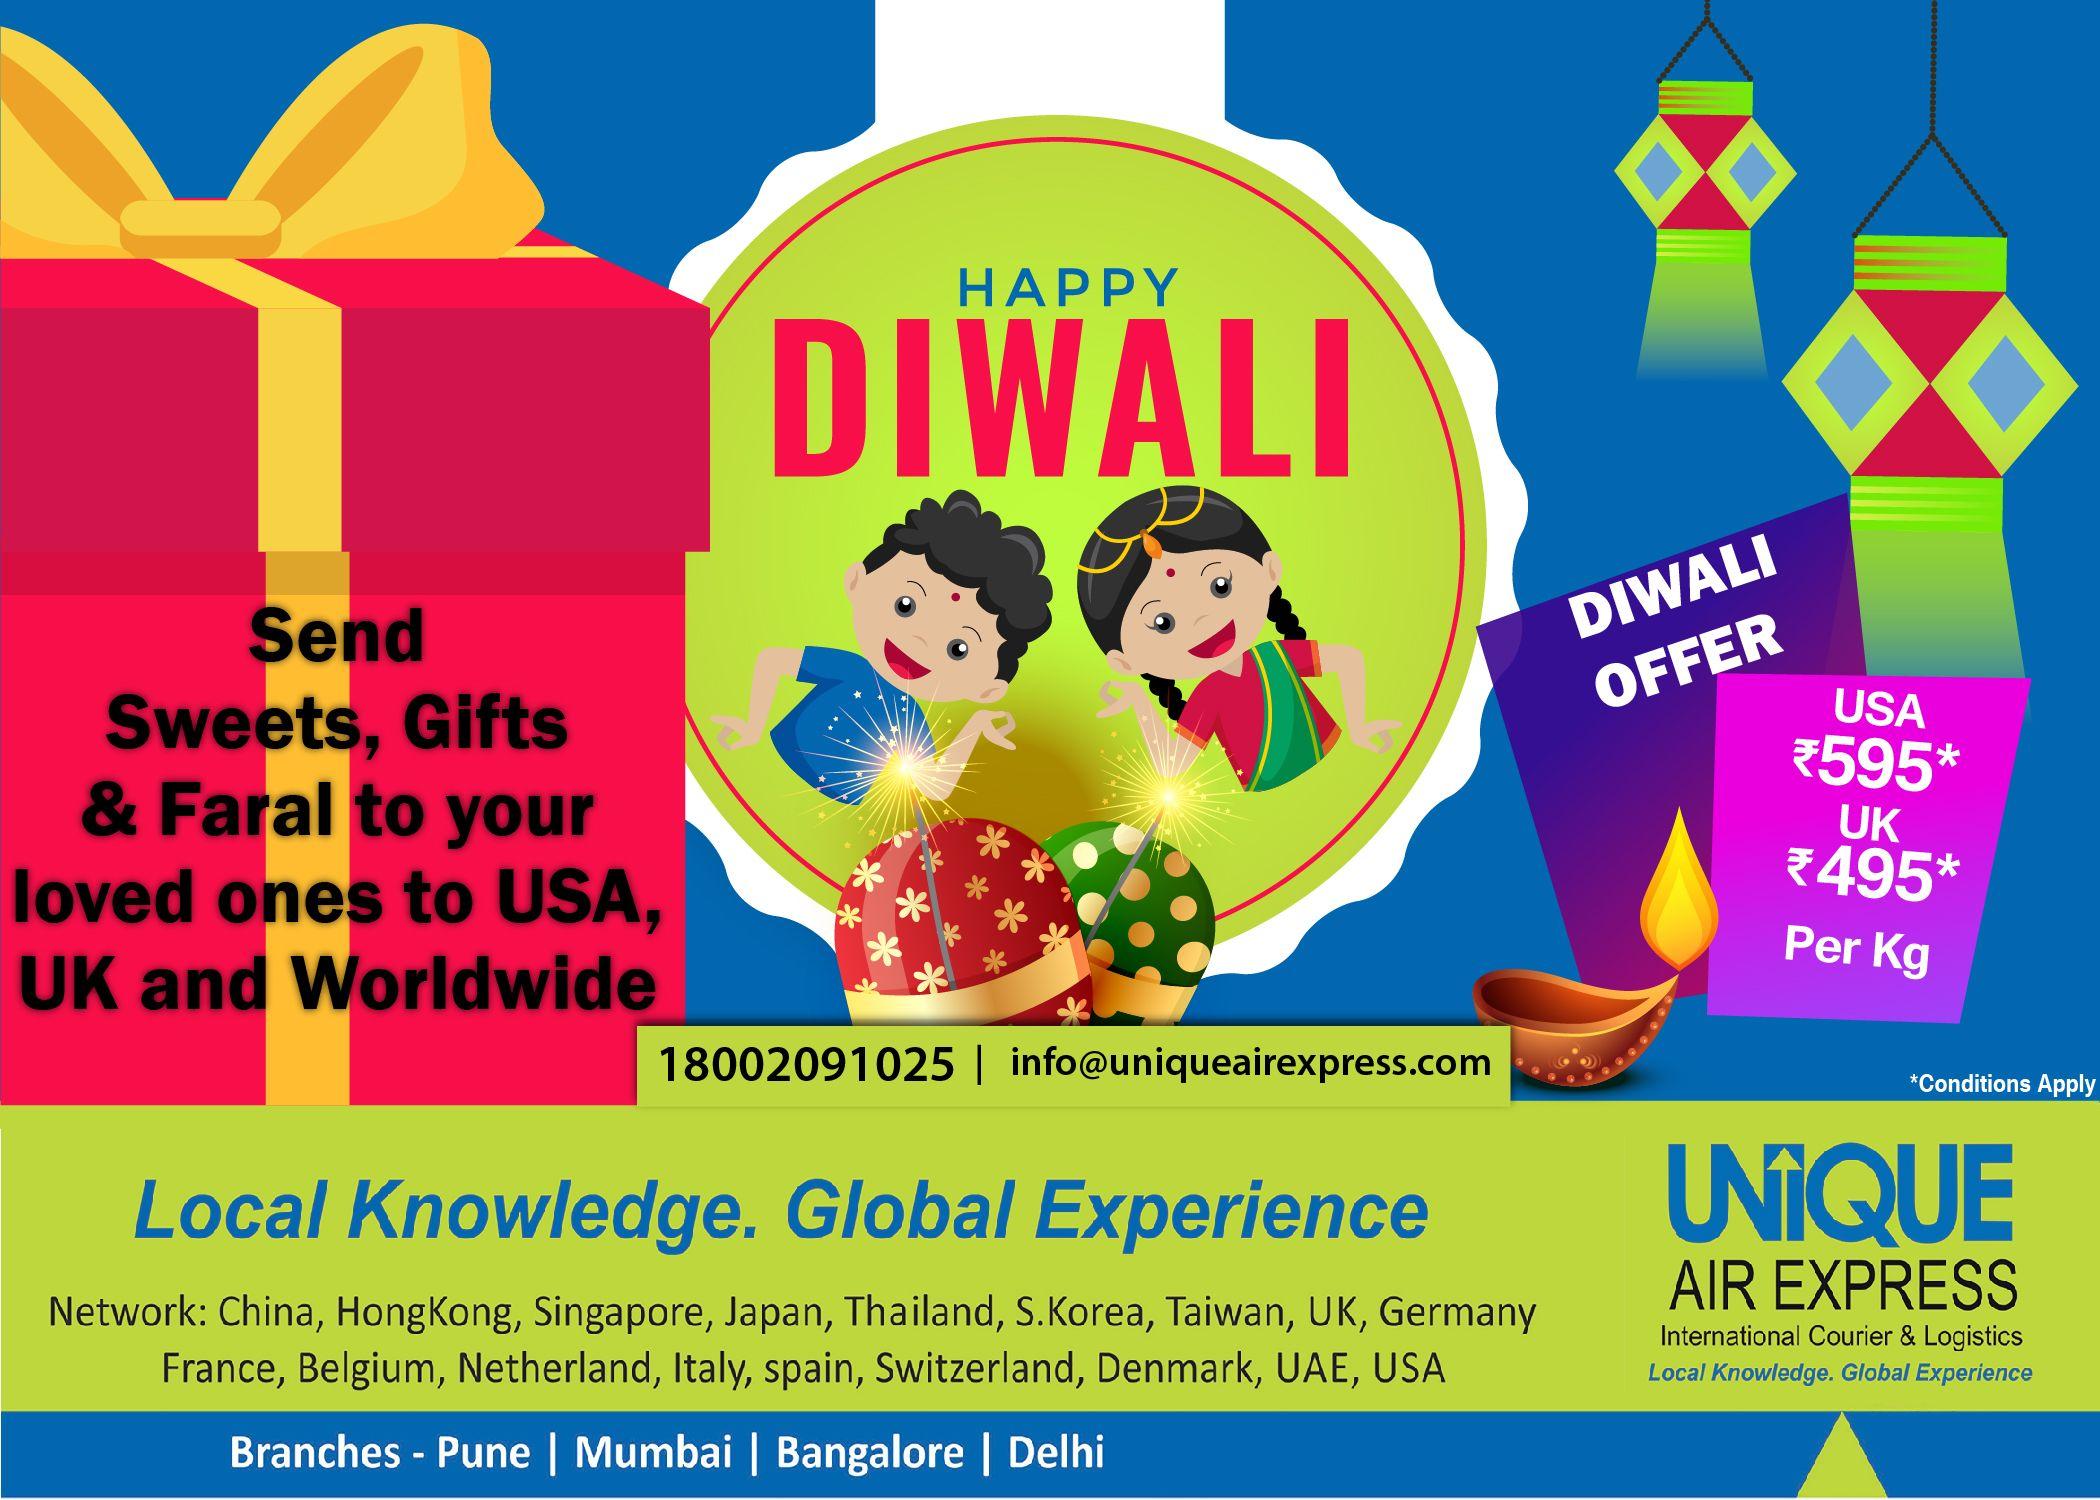 Diwali Festival coming near don't to send Diwali